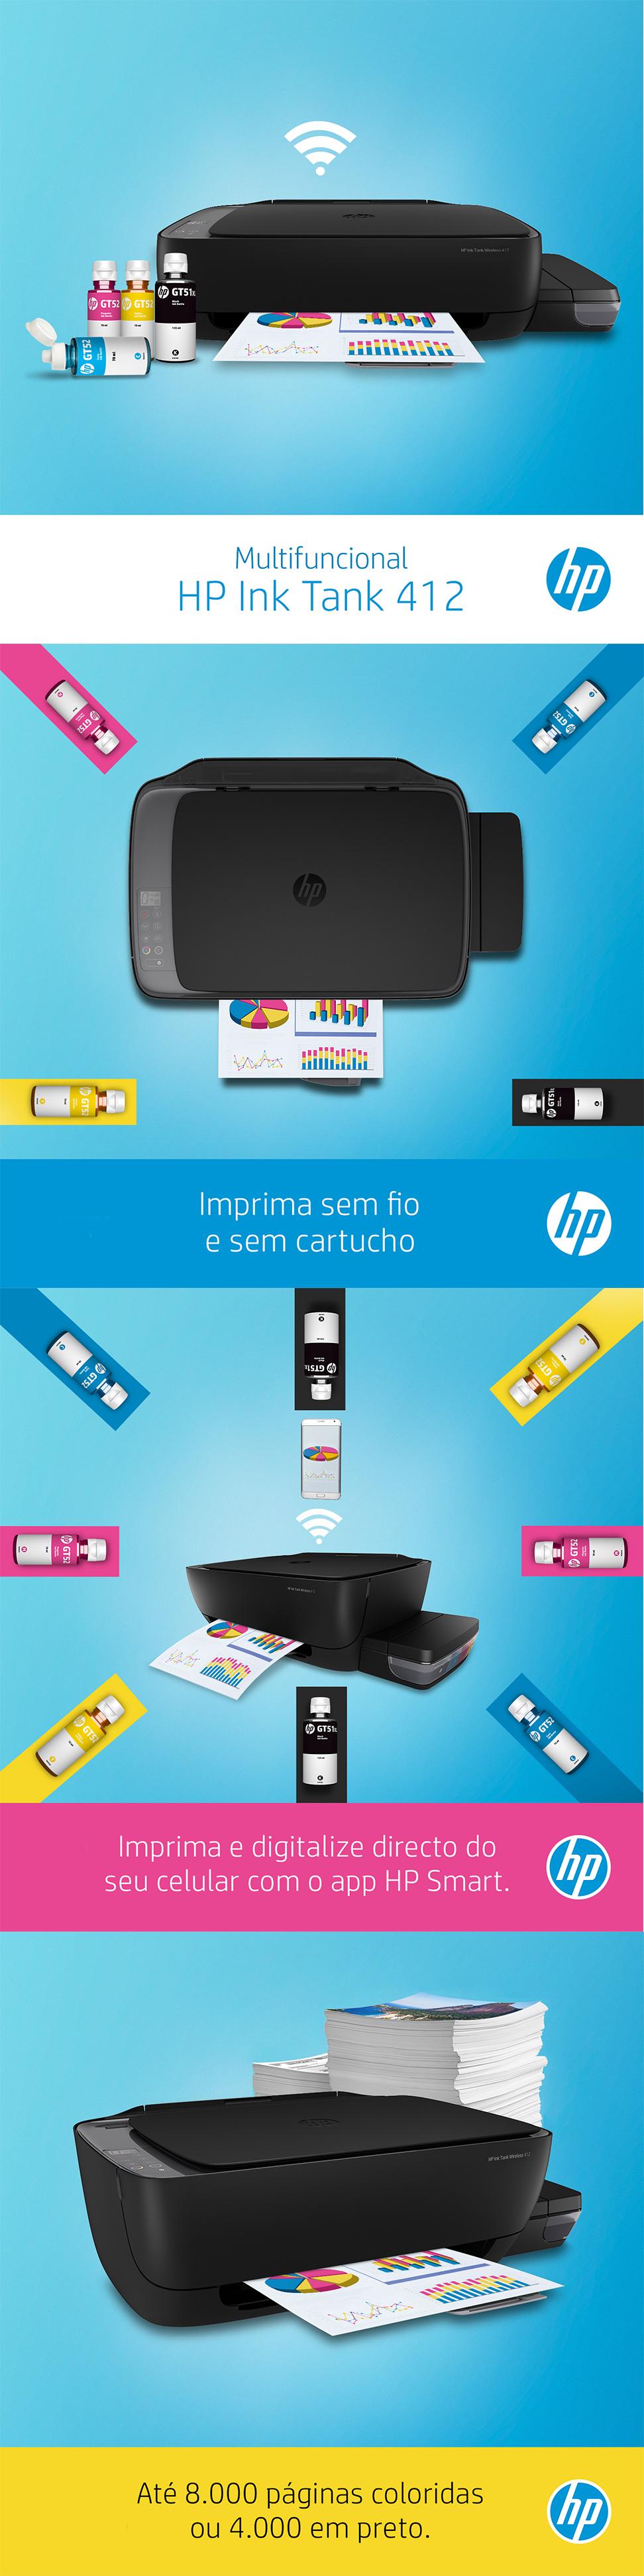 Recursos da Impressora Multifuncional HP Deskjet GT 412 Wi-Fi Bivolt